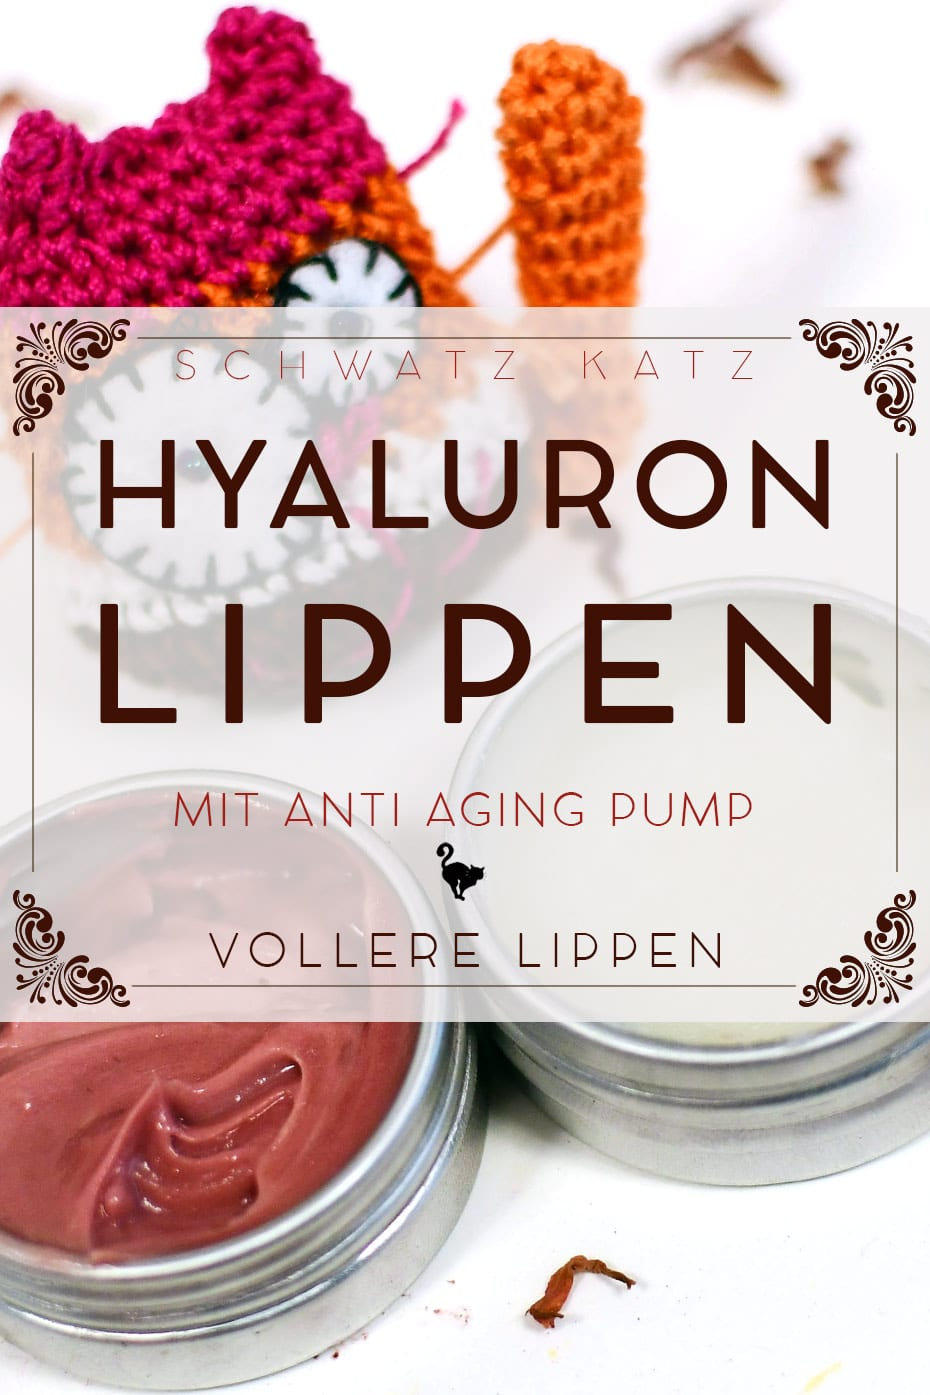 Hyaluron Lippenpflege mit Anti Aging Pump »Oh là là« | Schwatz Katz